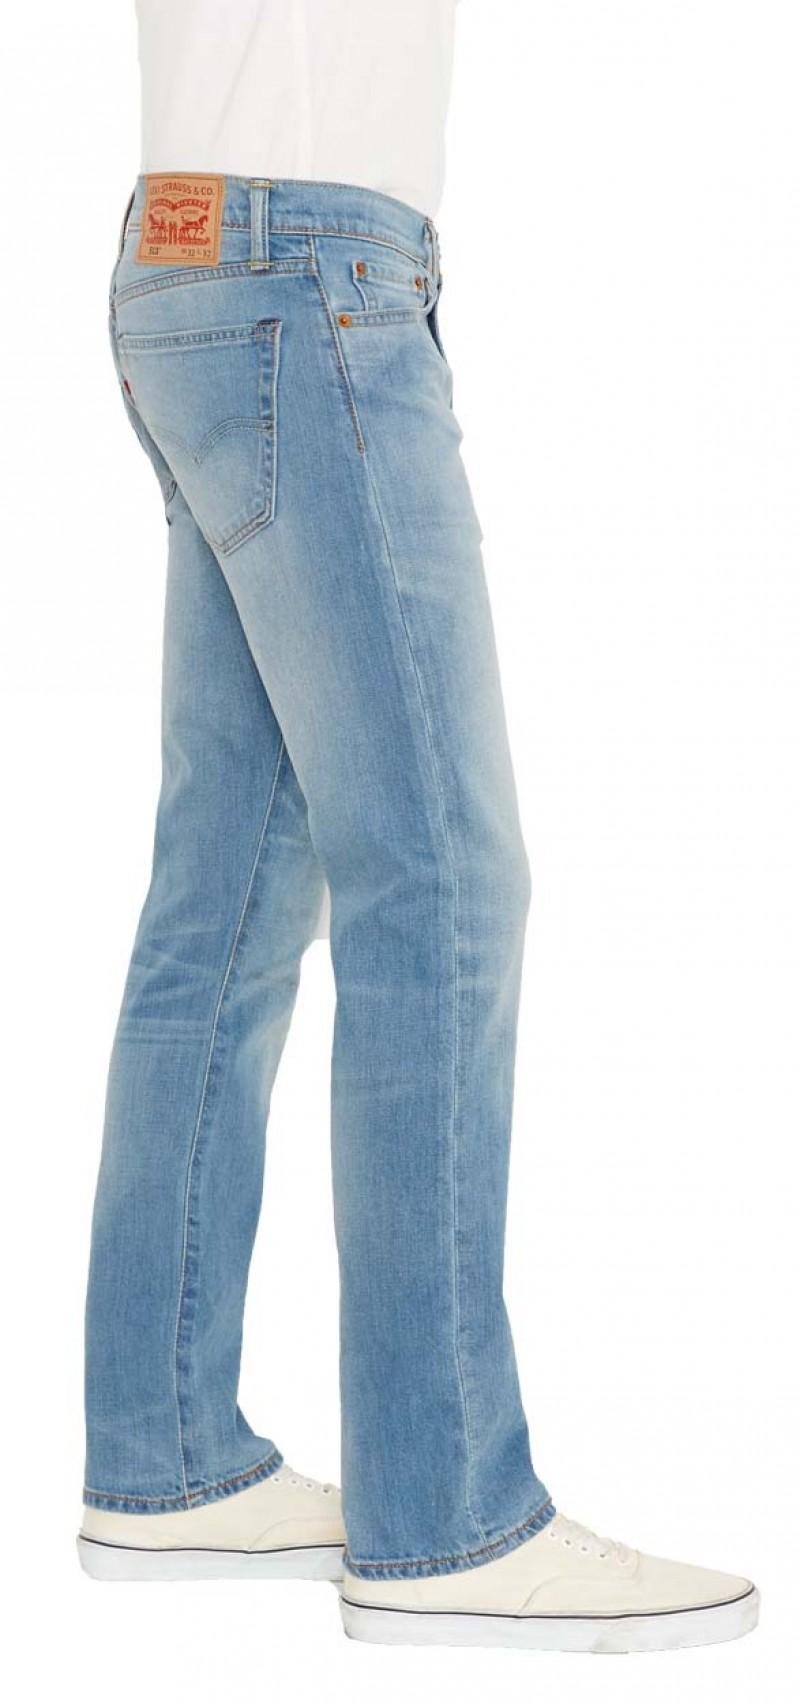 Levis 513 Jeans - Slim Straight - Aber